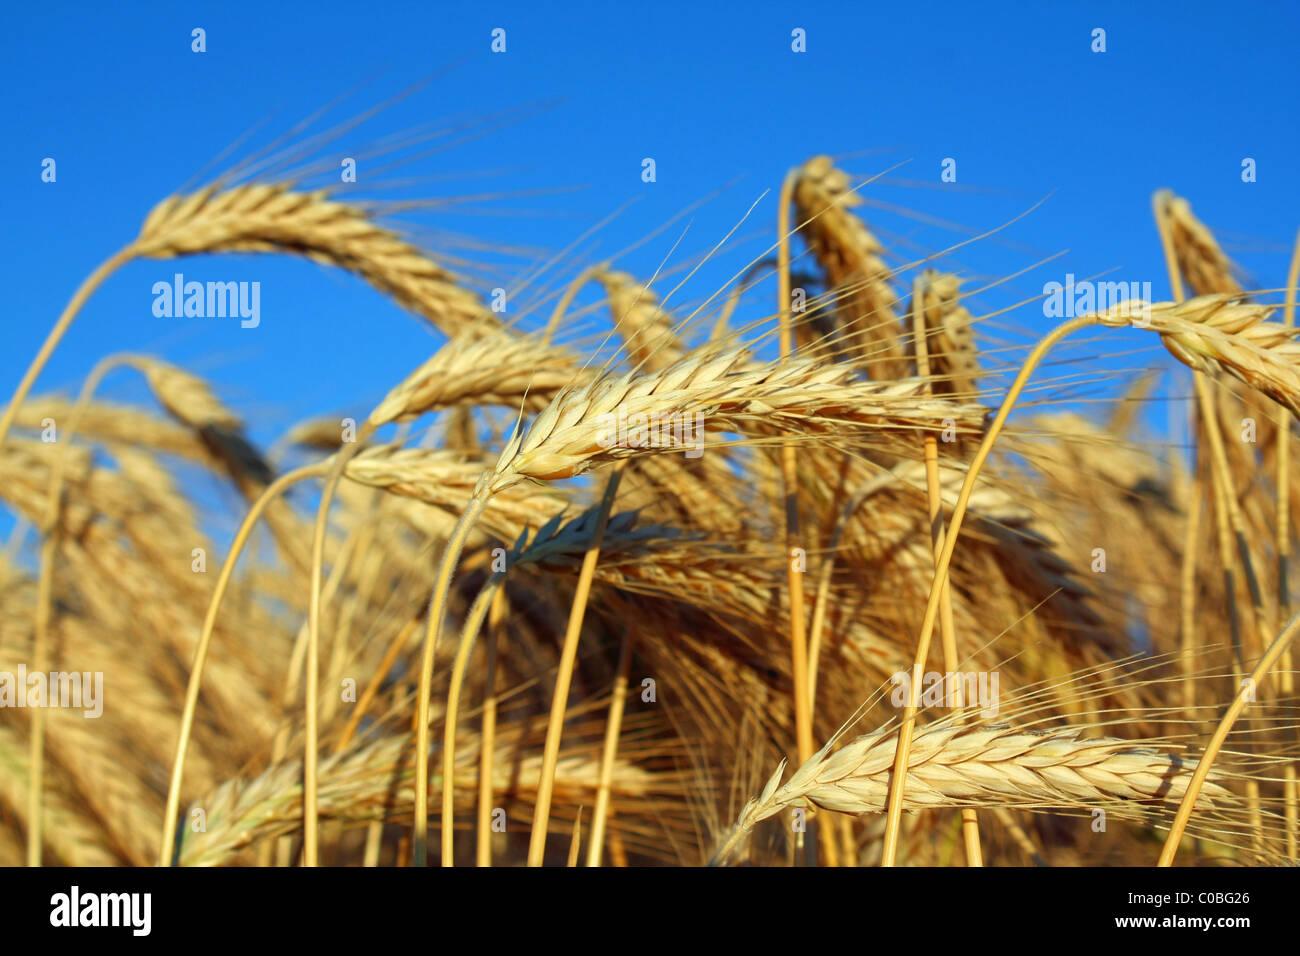 golden ripe wheat - Stock Image